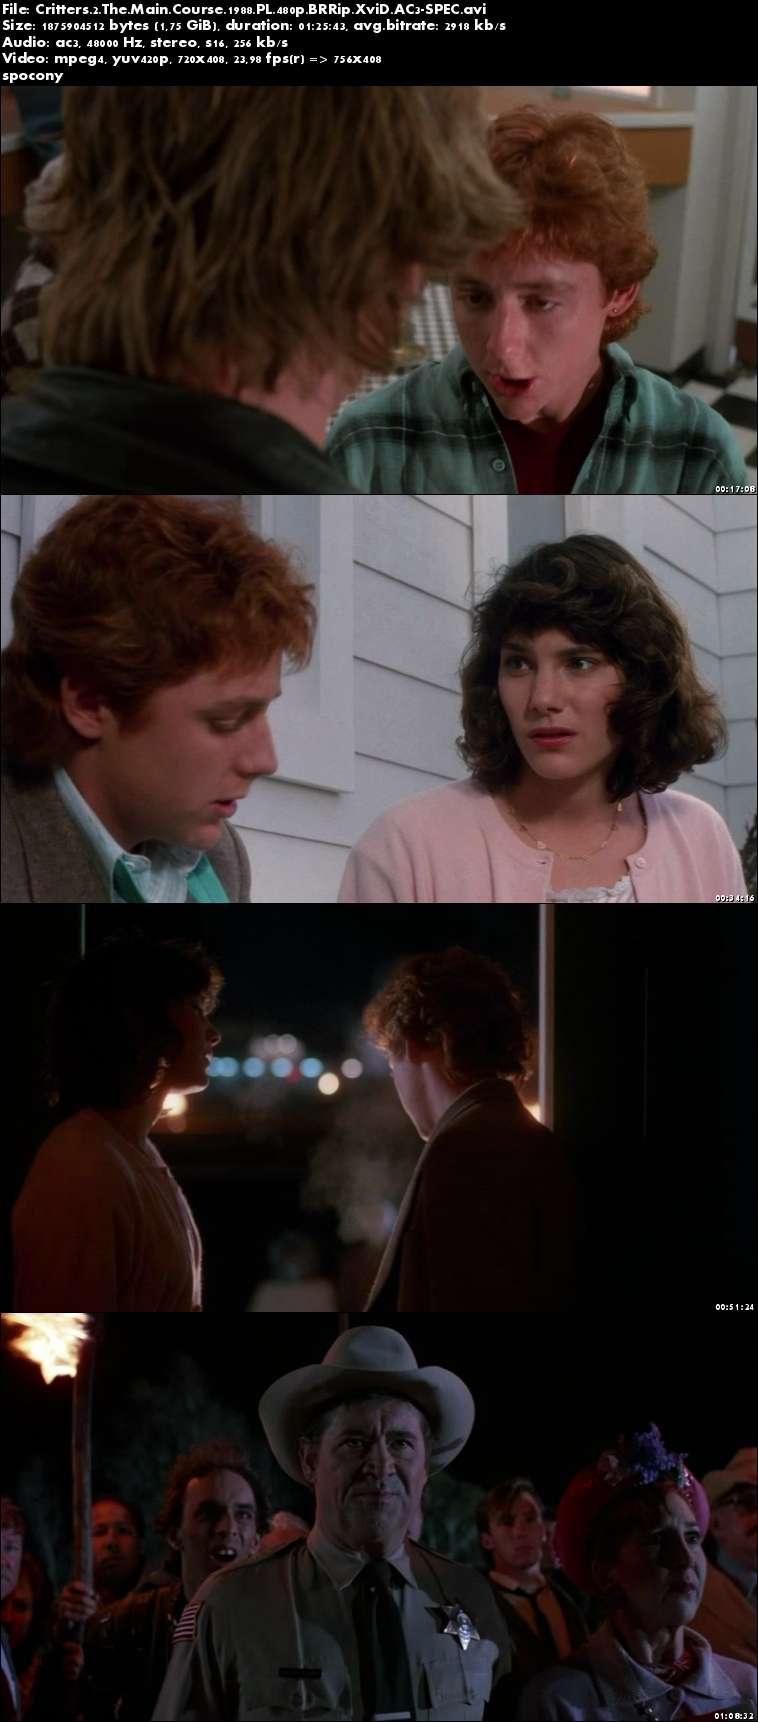 Critters 2 / Critters 2: The Main Course (1988) PL.480p.BRRip.XviD.AC3-SPEC [Lektor PL]